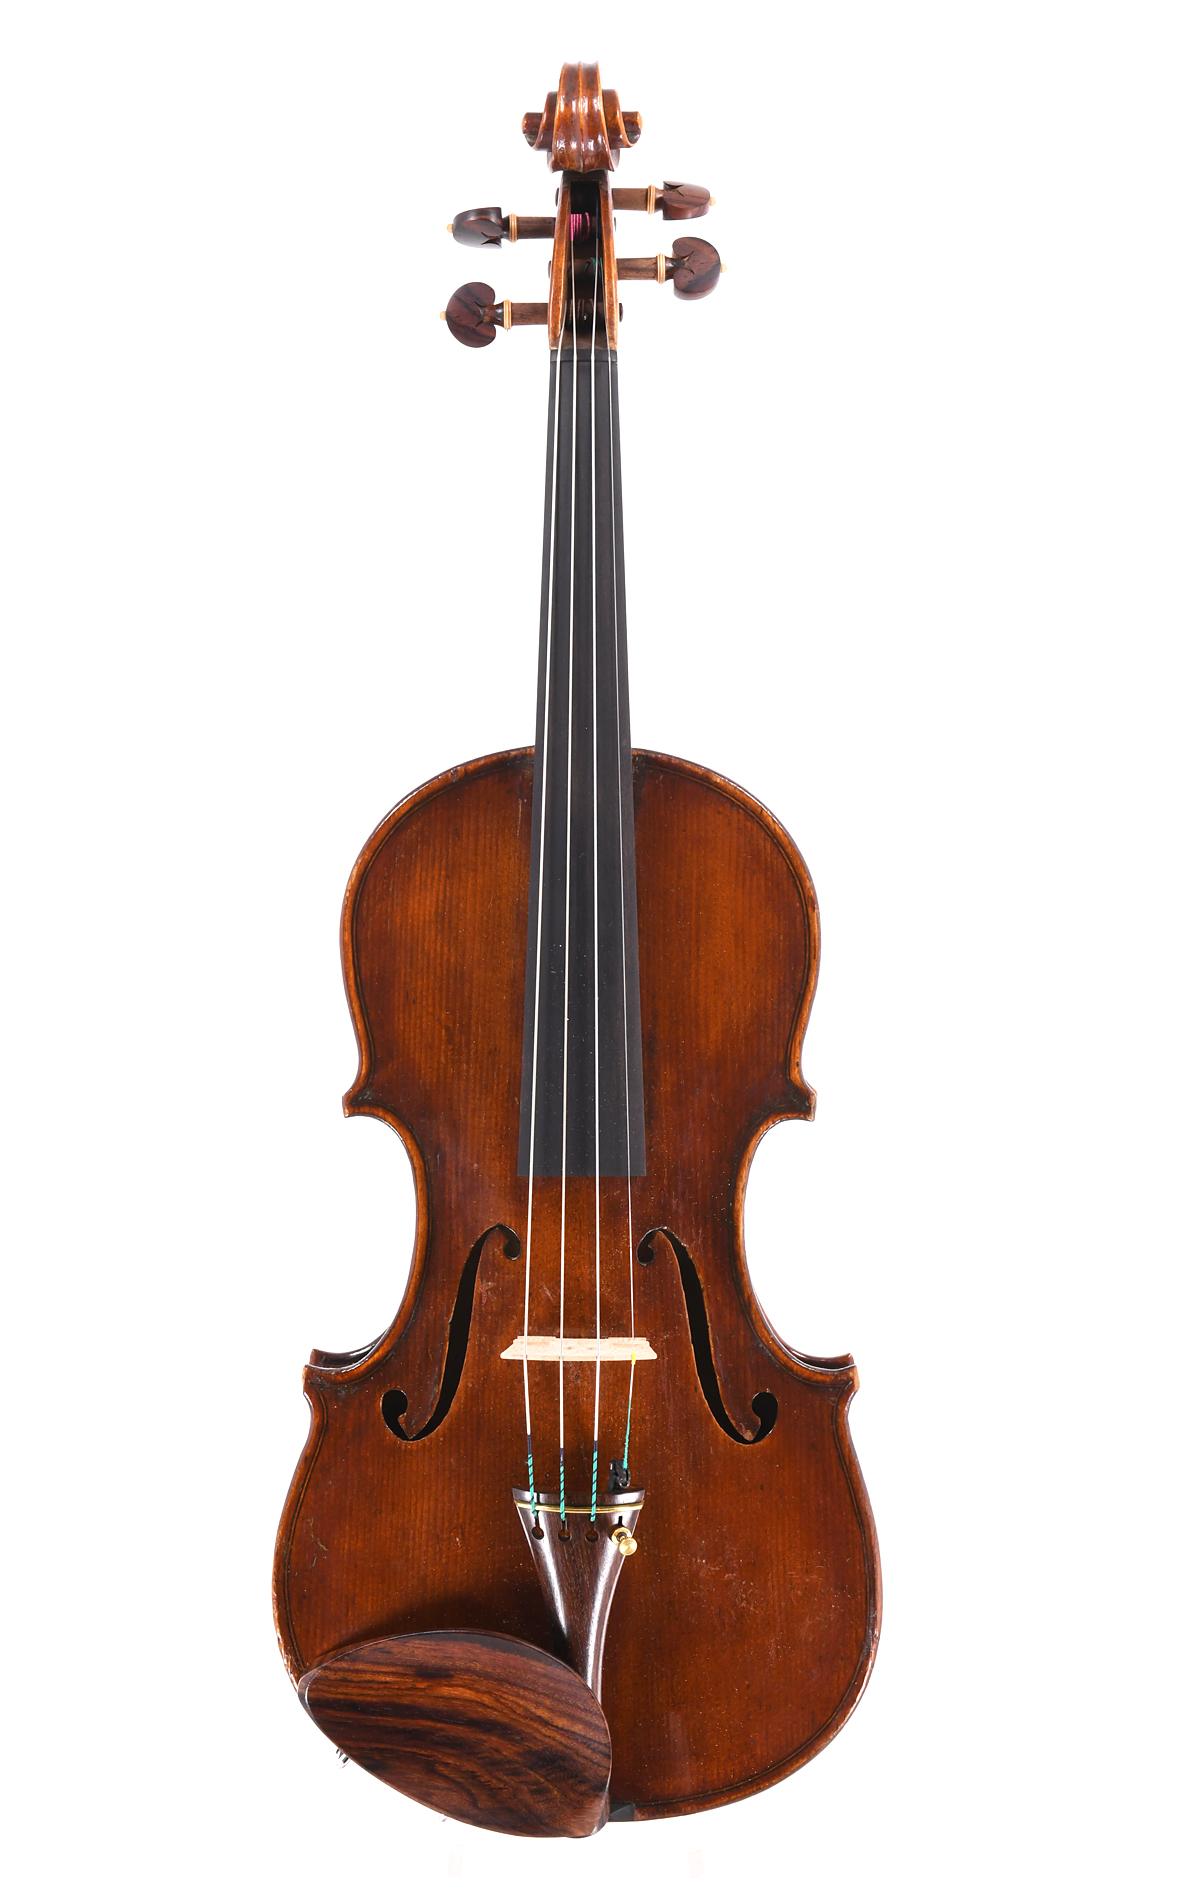 Italian violin by Raffaele Bozzi